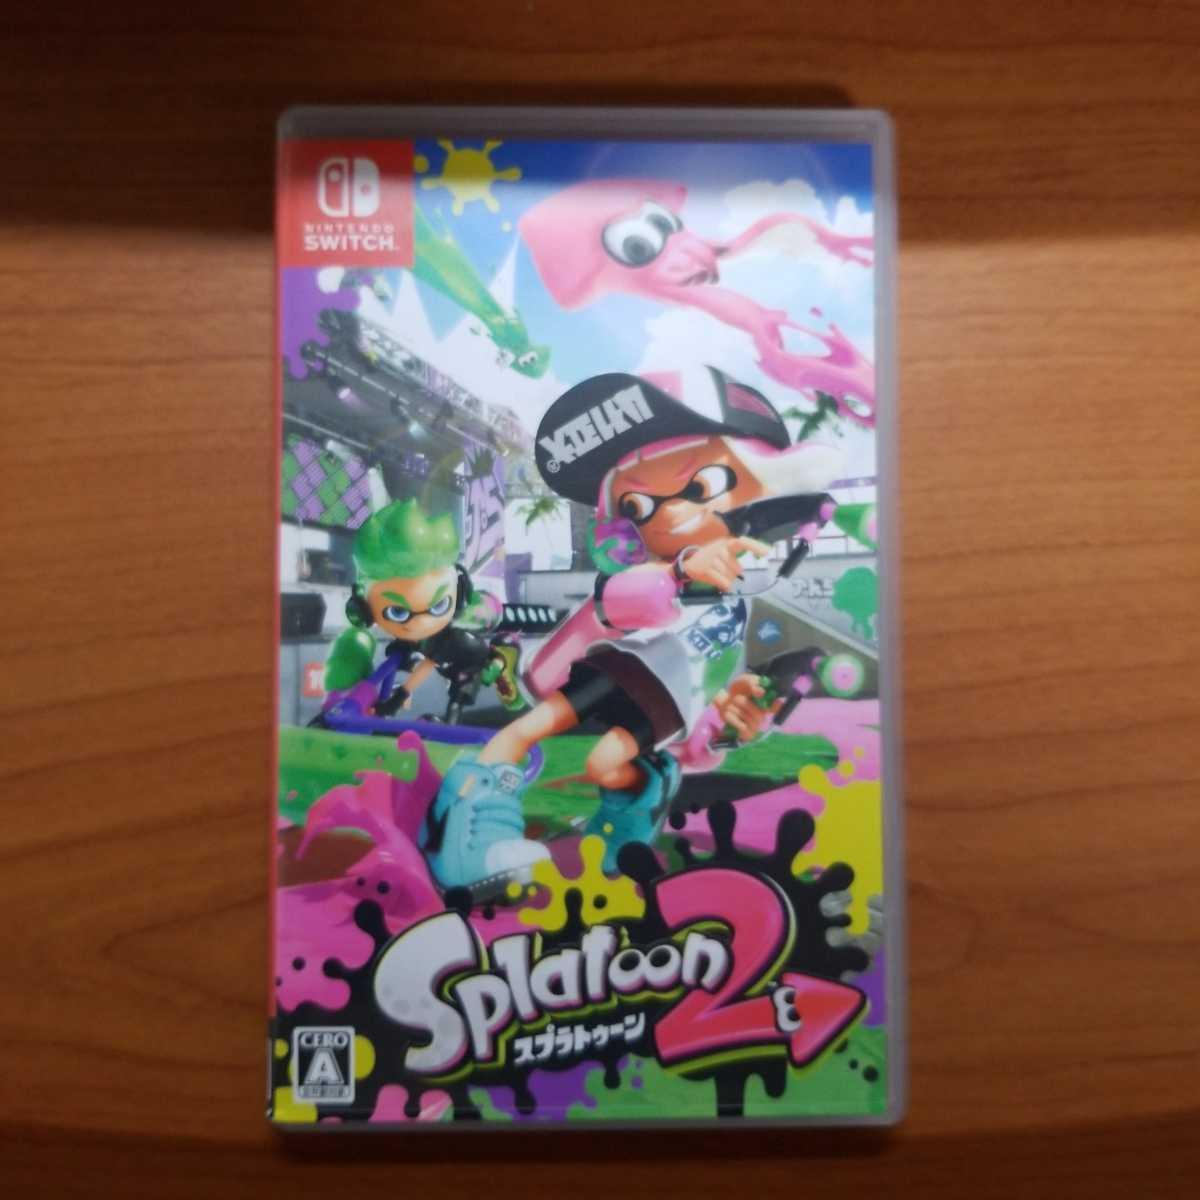 Switch スプラトゥーン2 Splatoon2 任天堂スイッチ Switch カセット ソフト 送料無料